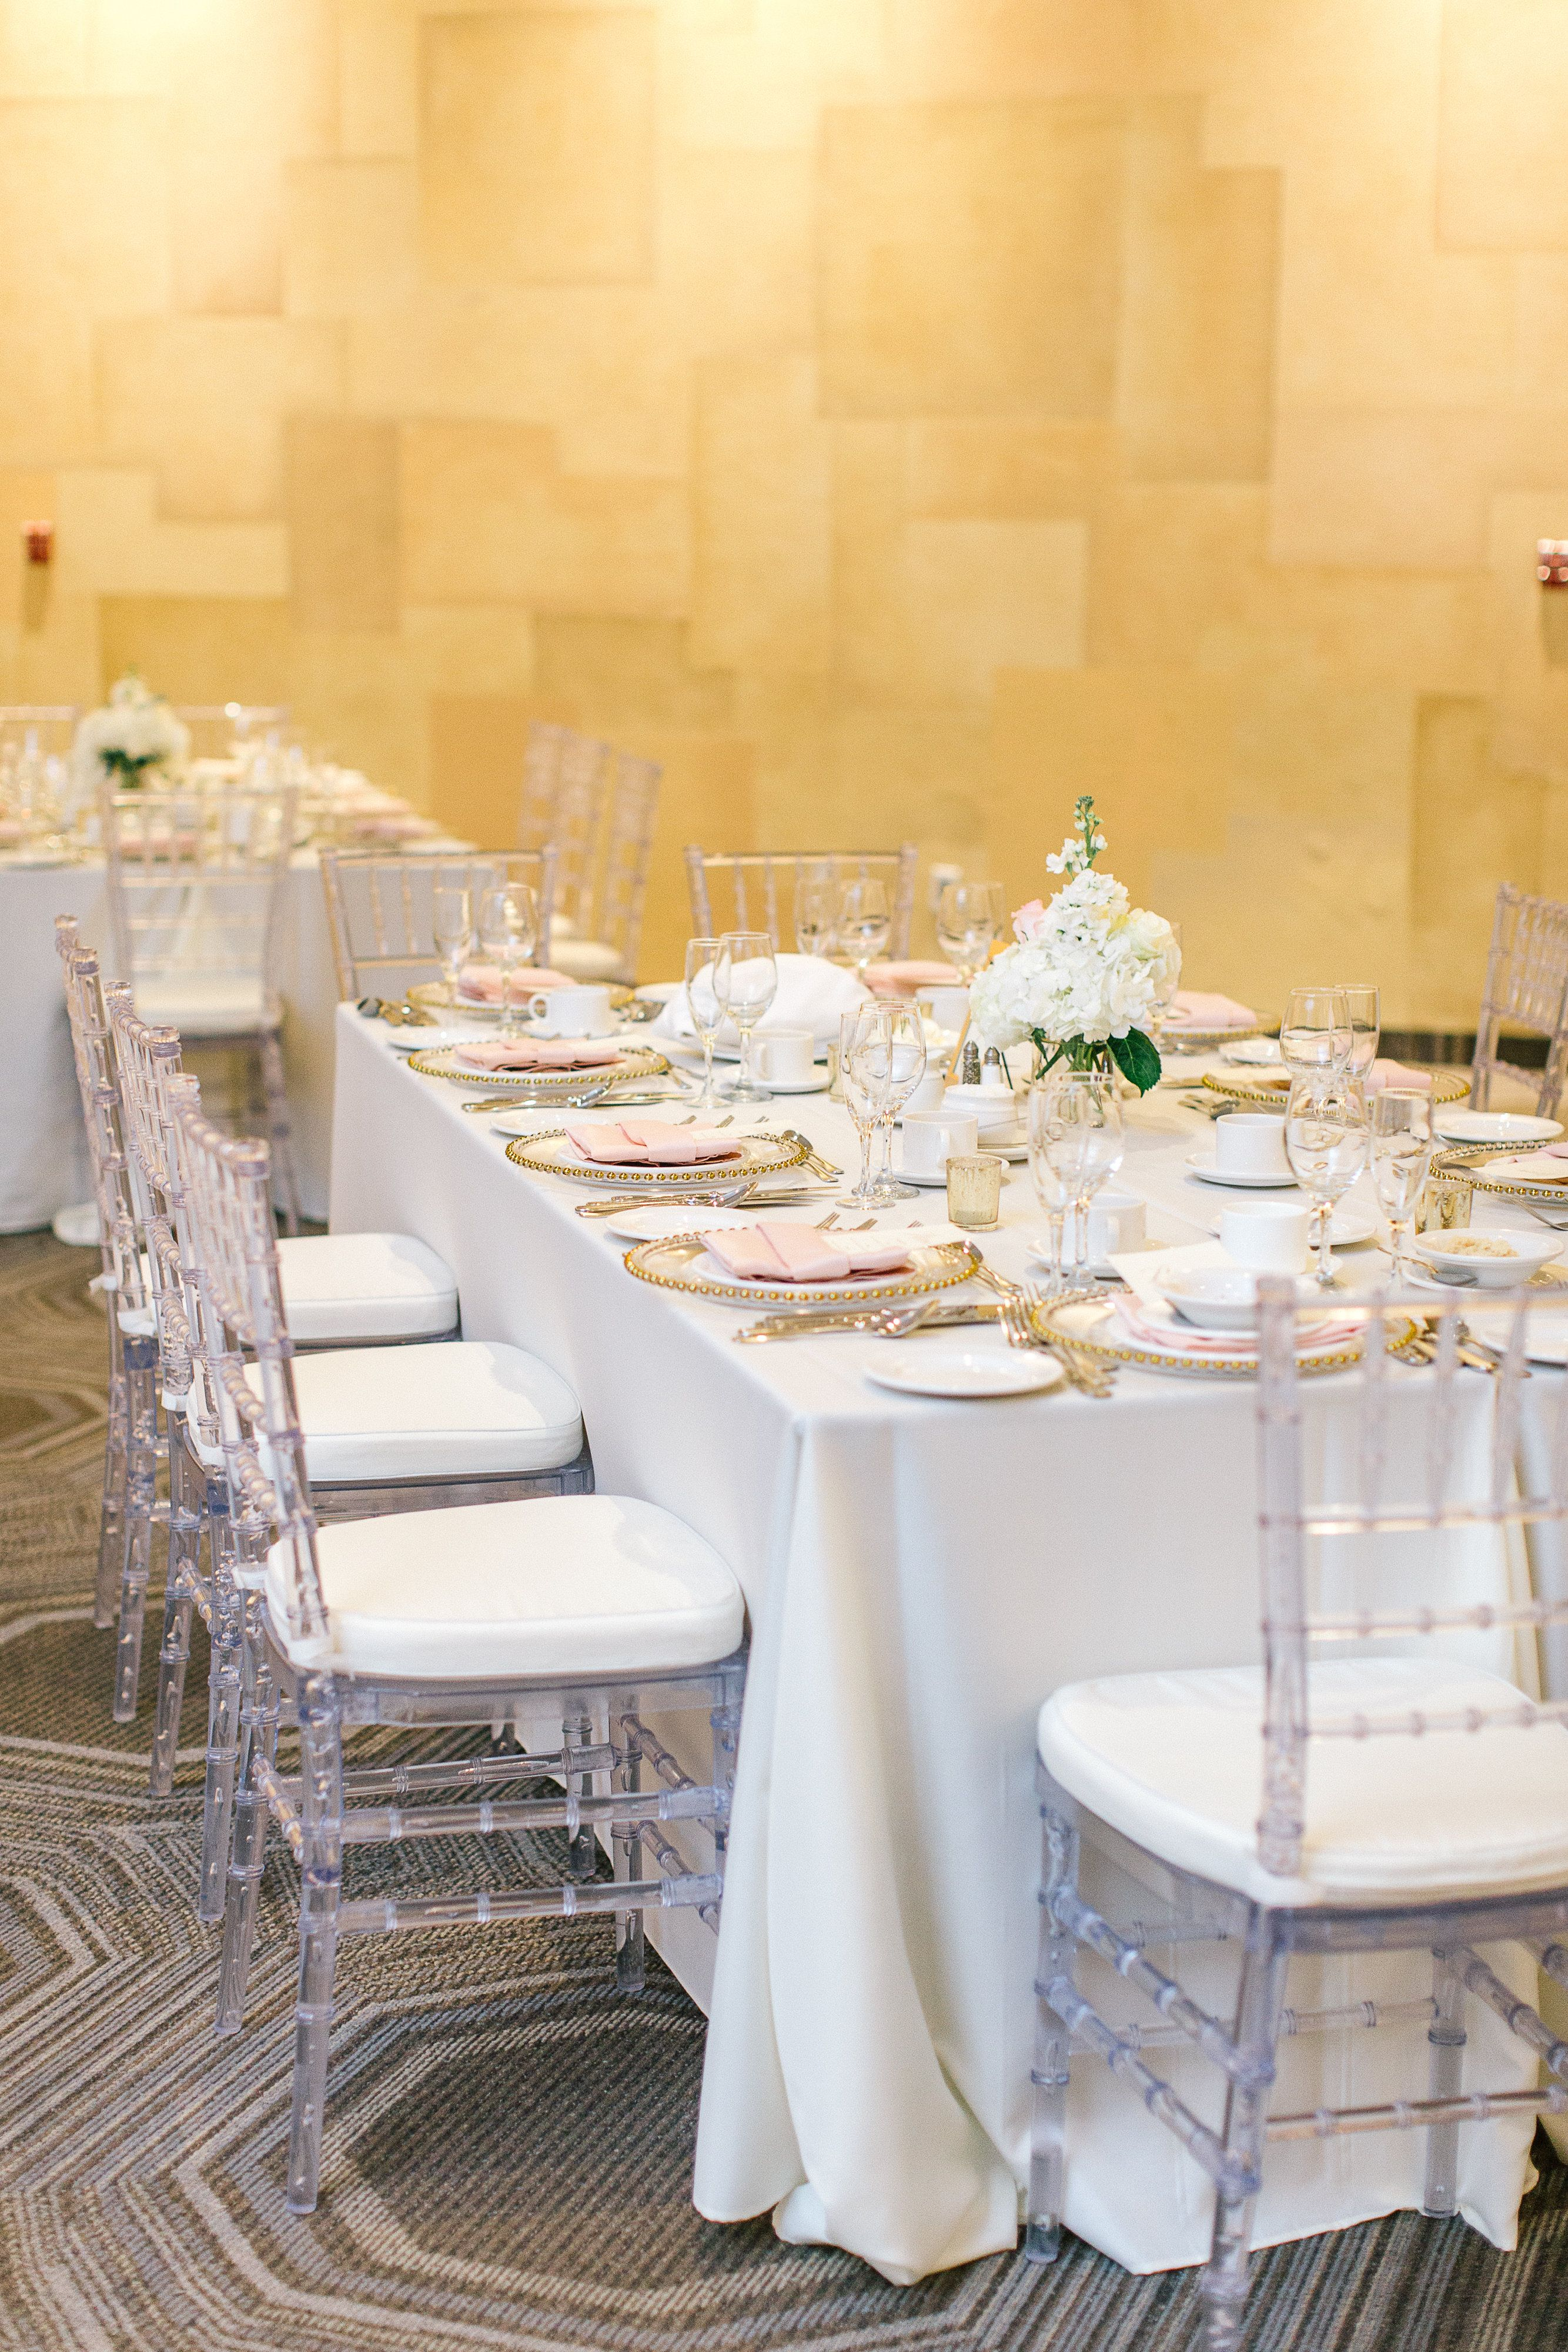 Reception Table Design Crystal Chiavari Chairs Gold Beaded Charger Plates Photo Tamara Lockwood Photography Decor Wedding Decorations Chiavari Chairs